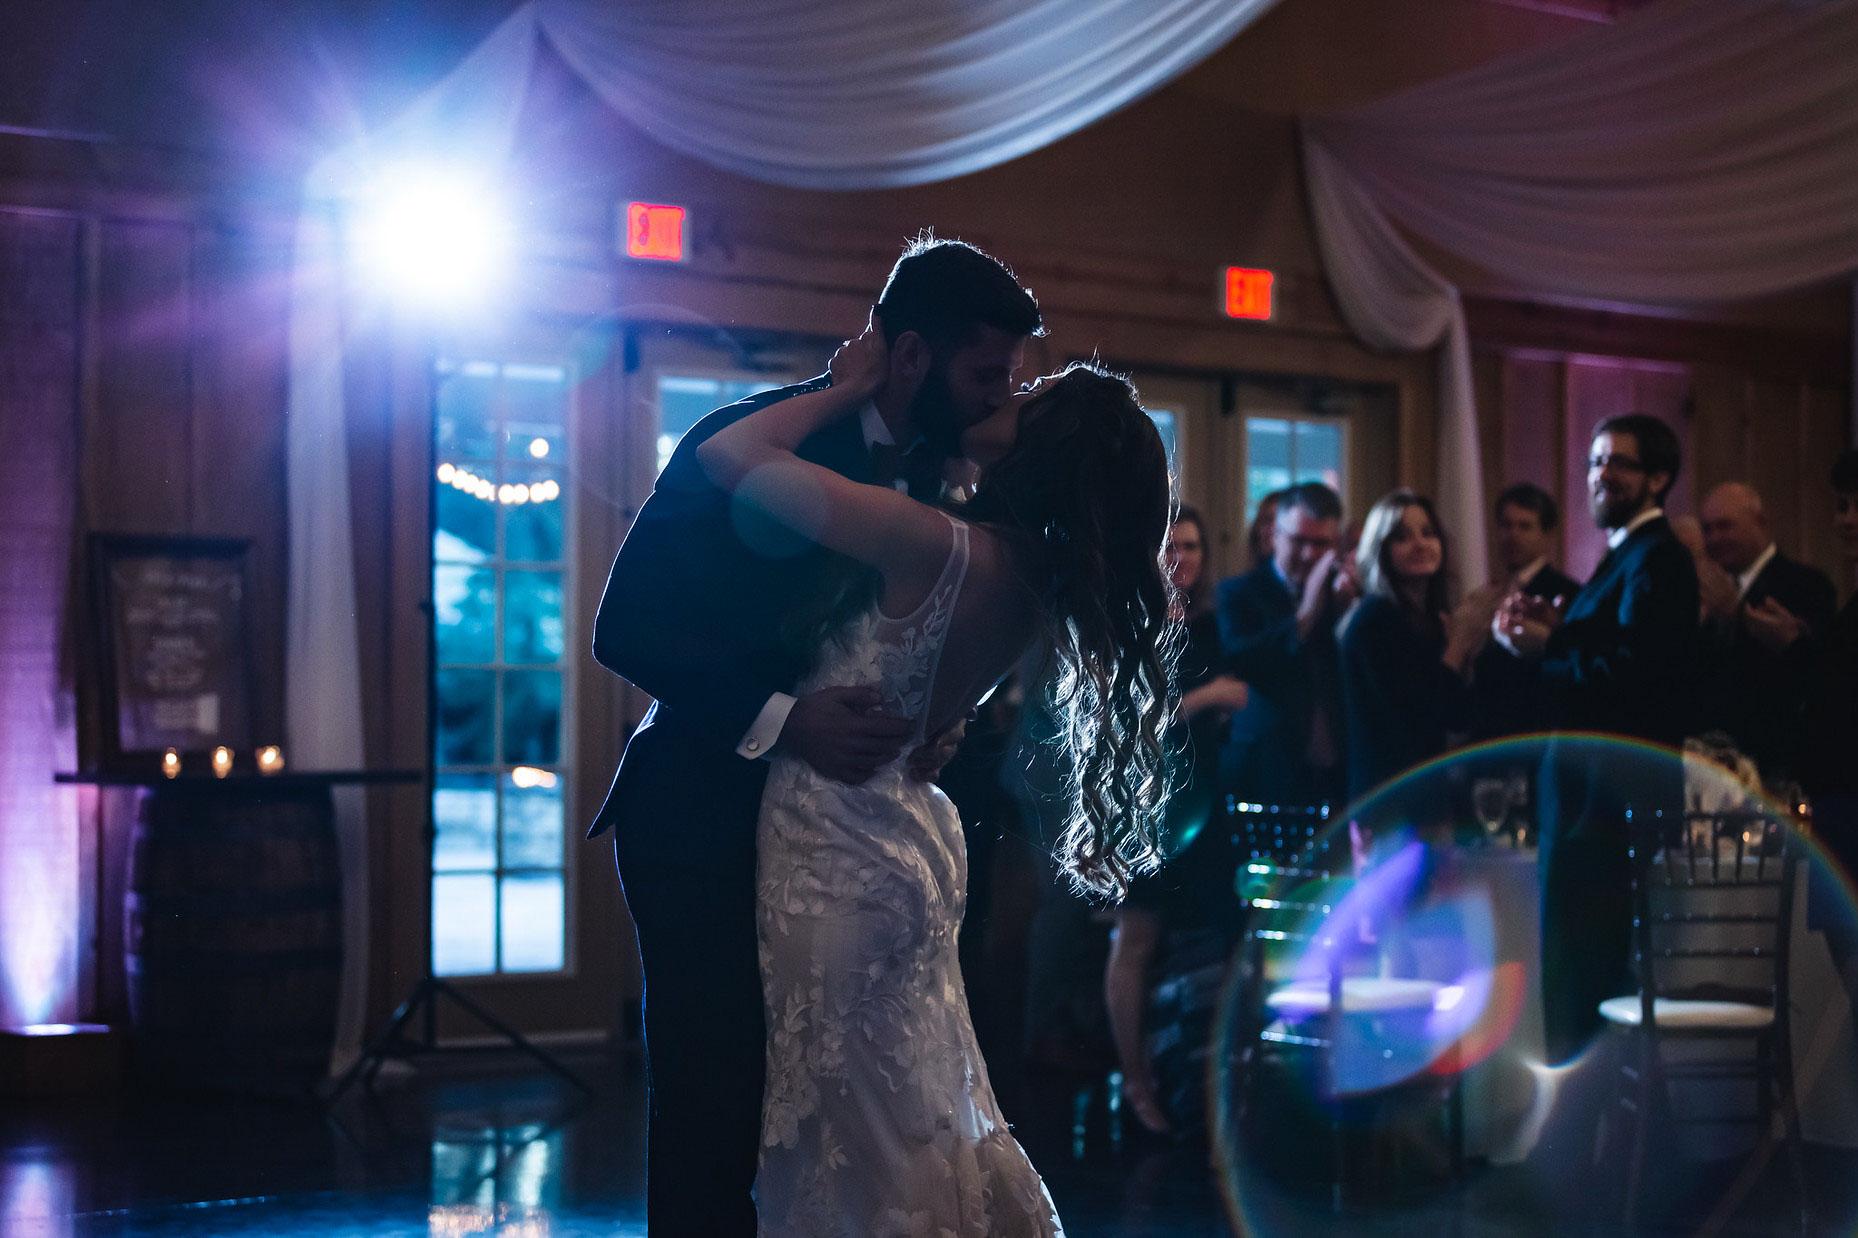 adam-szarmack-bowing-oaks-wedding-photographer-jacksonville-116.jpg